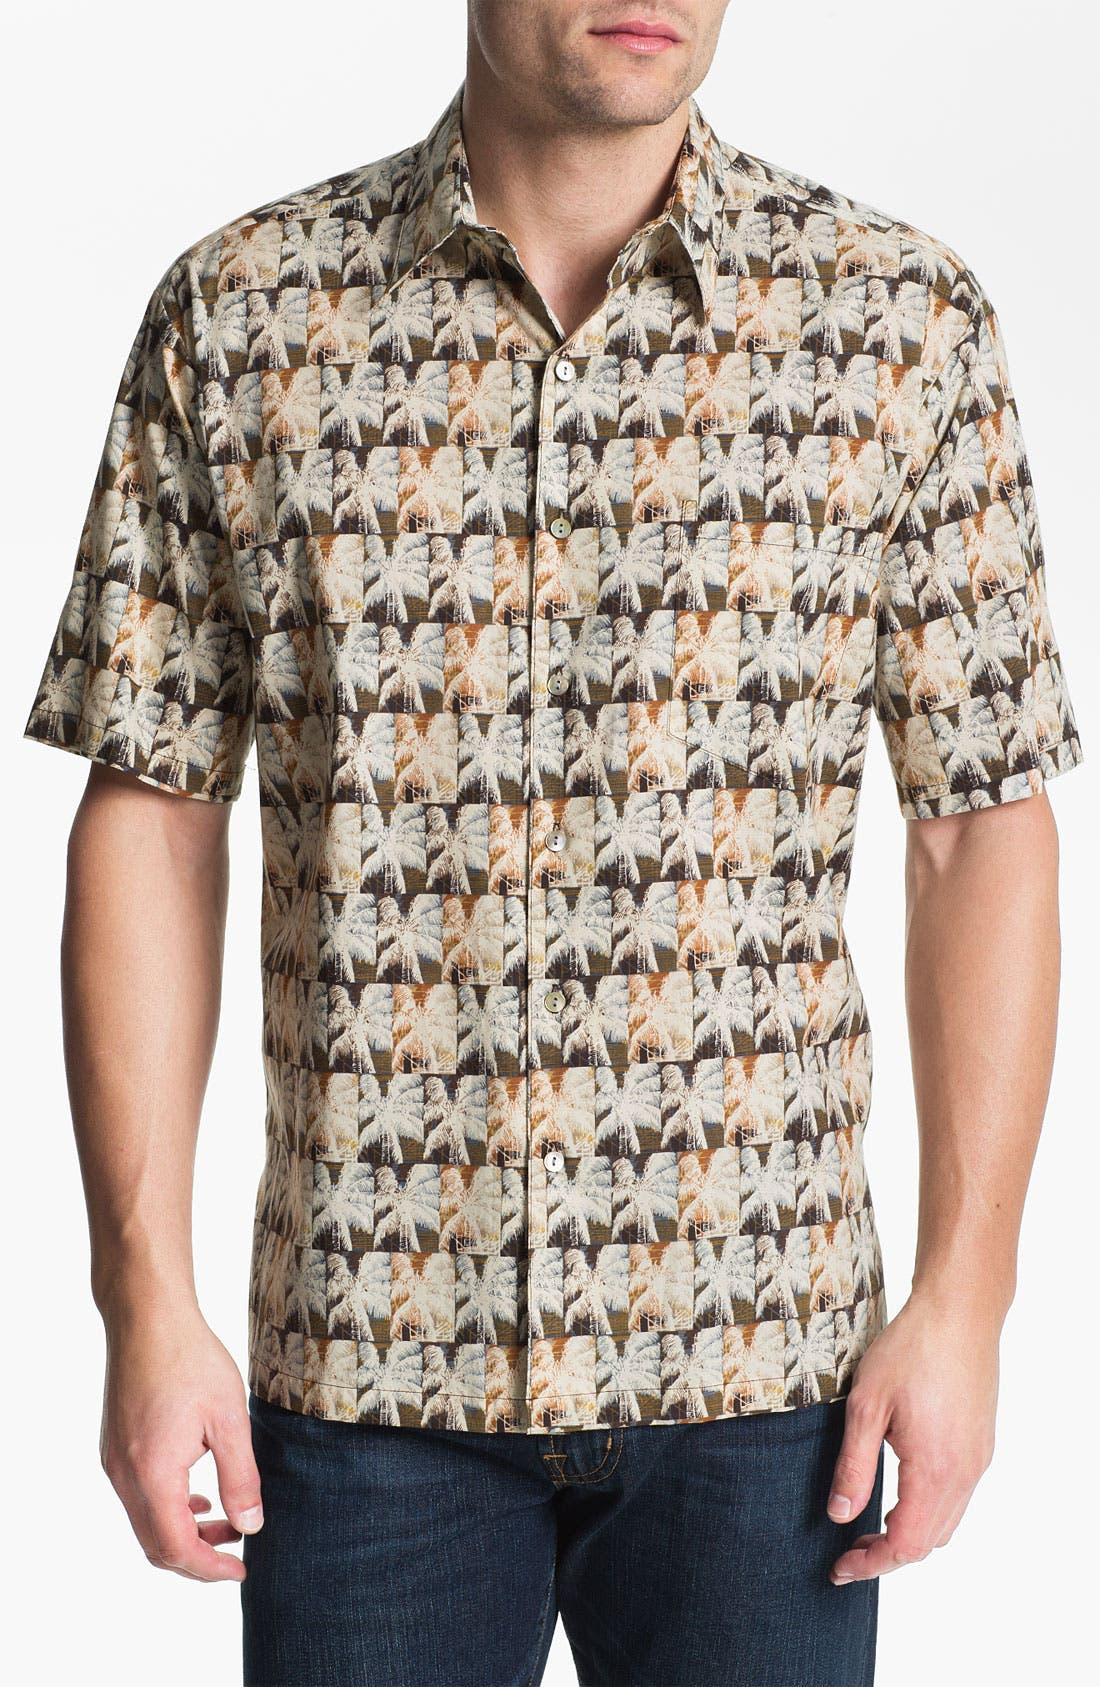 Alternate Image 1 Selected - Tori Richard 'Palmetto' Campshirt